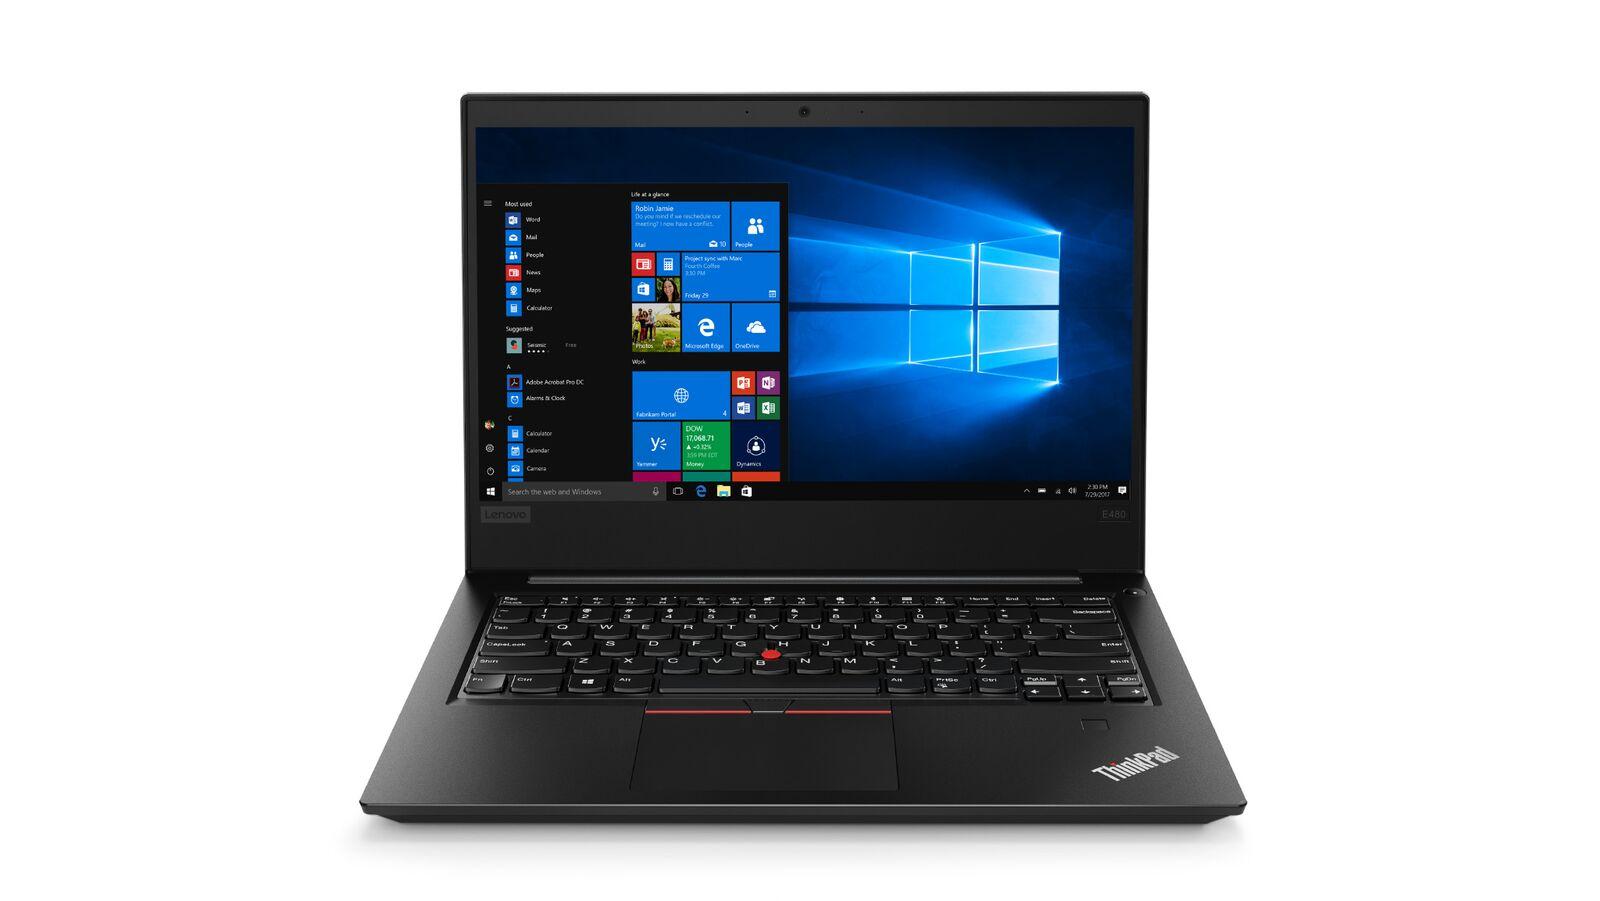 Lenovo Thinkpad E480 14''FH/i5-8250U/8G/256/F/Intel UHD/W10P/černý